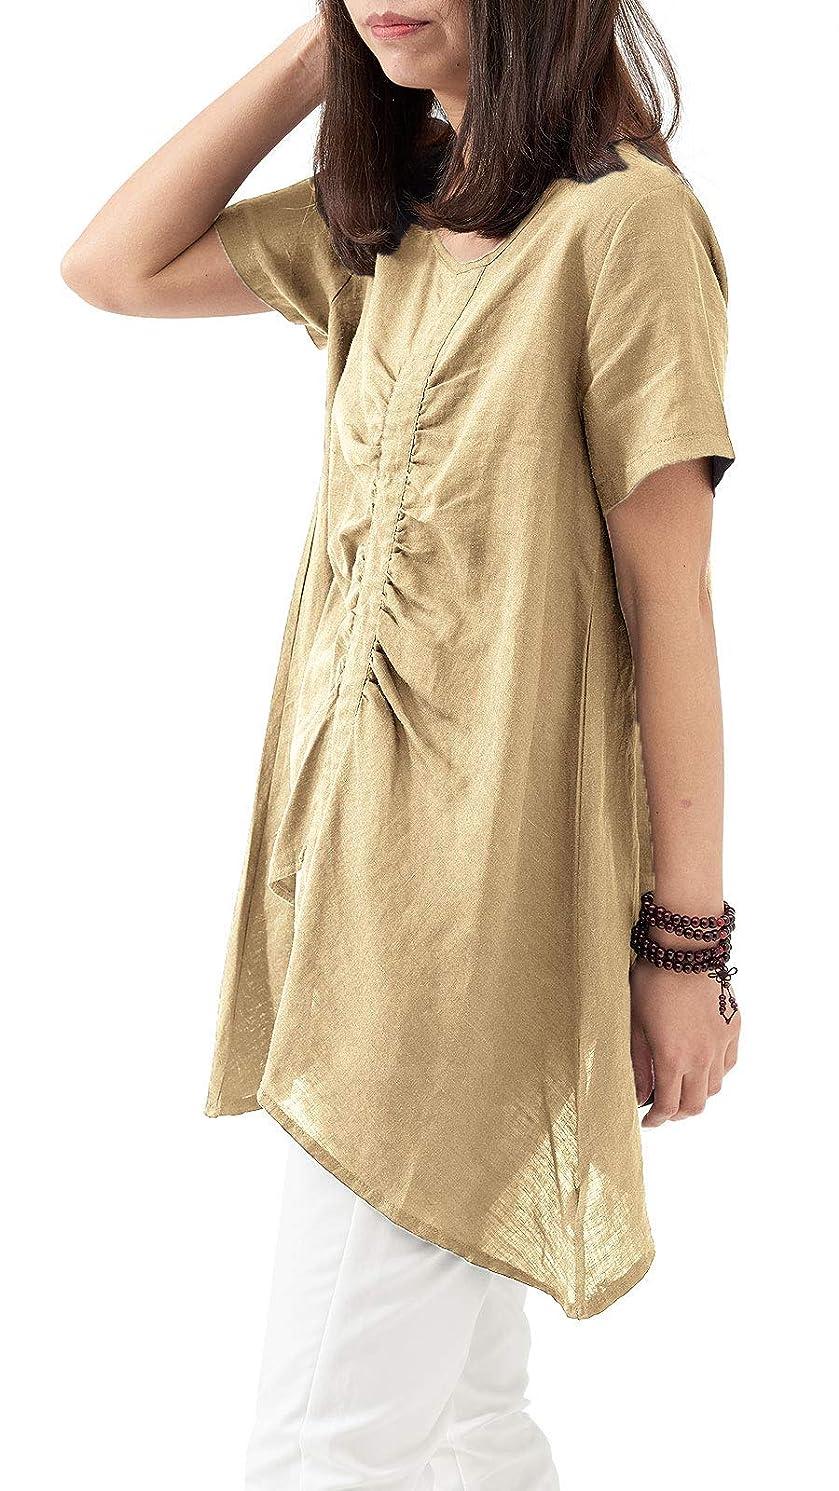 Les umes Women's Plus A Line Cotton Linen T-Shirt Tops Short Sleeves Irregular Blouse